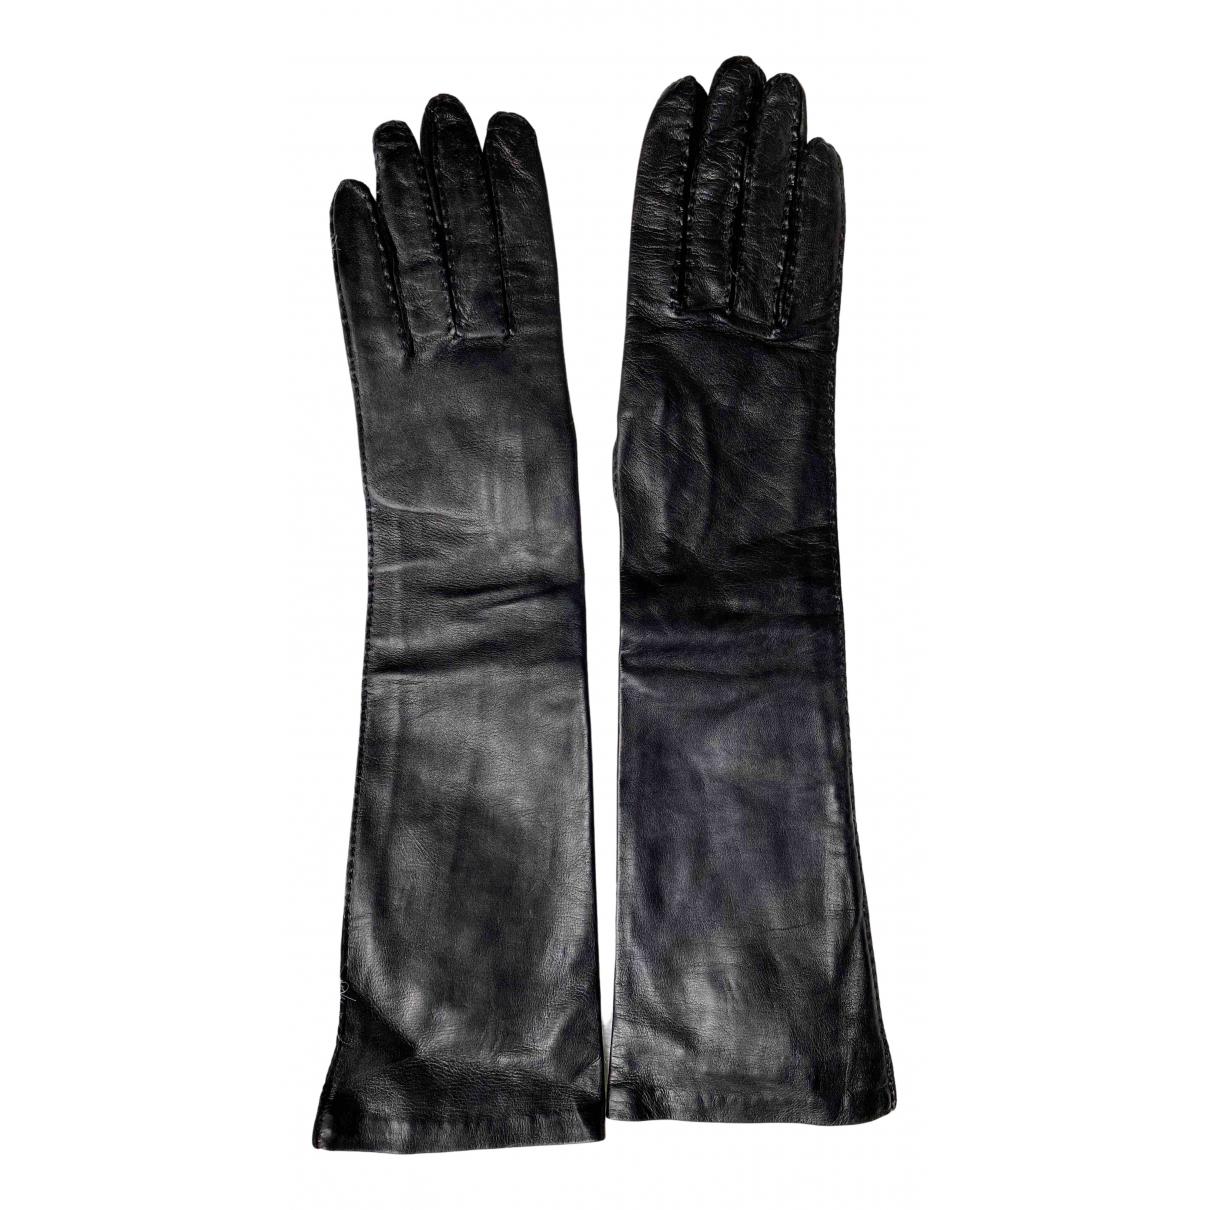 Max Mara s \N Handschuhe in  Schwarz Leder